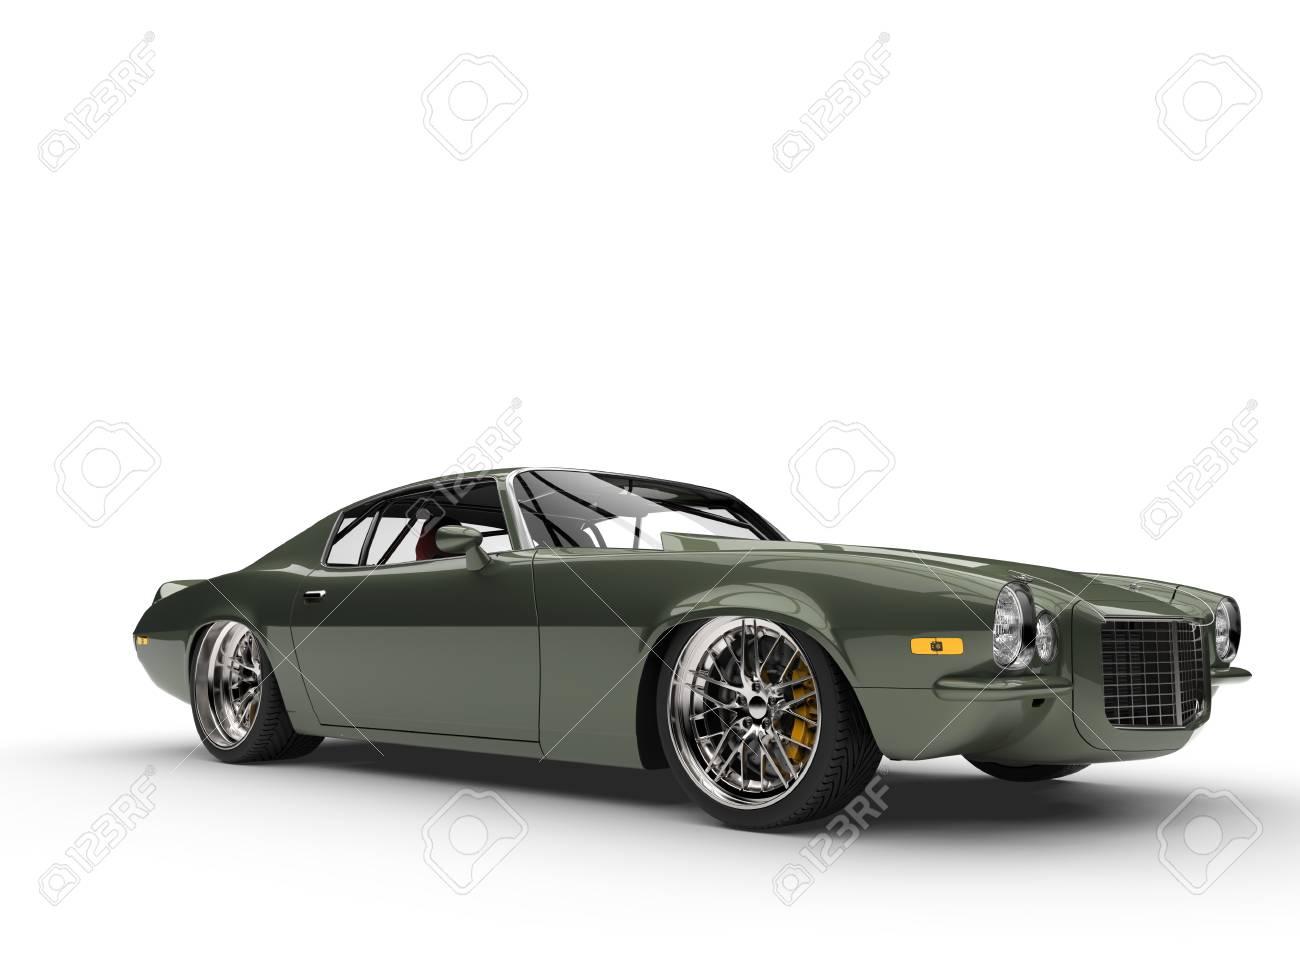 Deep Metallic Green Classic Old School American Car Stock Photo ...